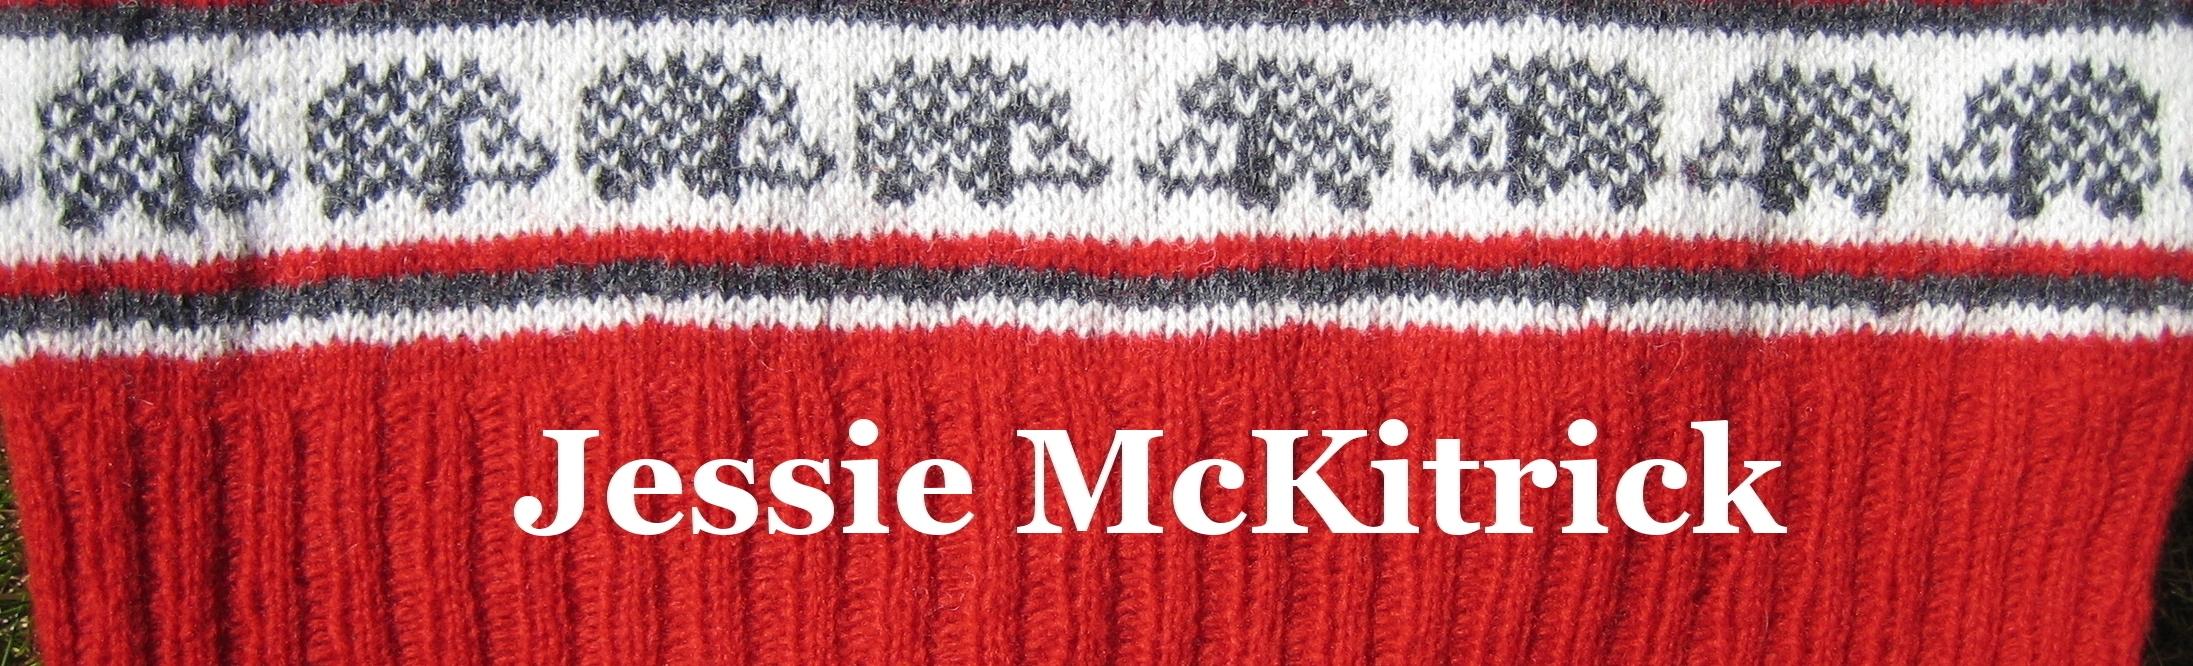 Jessie McKitrick (@jessiemckitrick) Cover Image